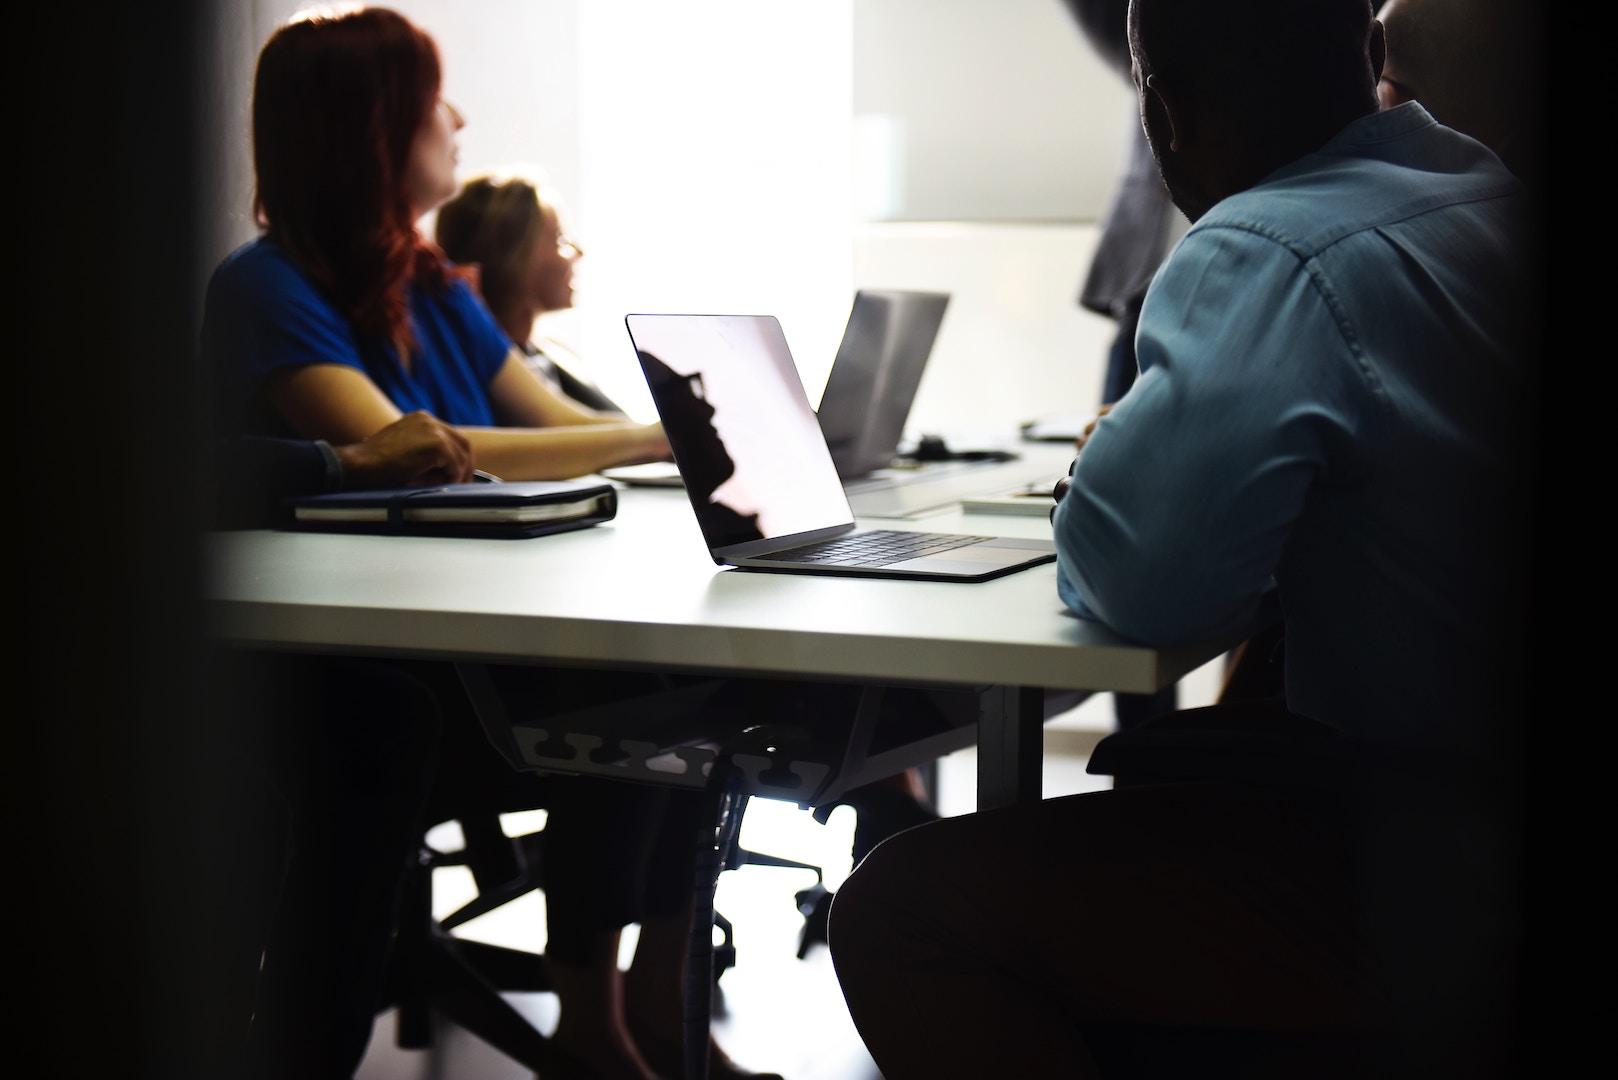 Strategy, not technology, drives digital transformation